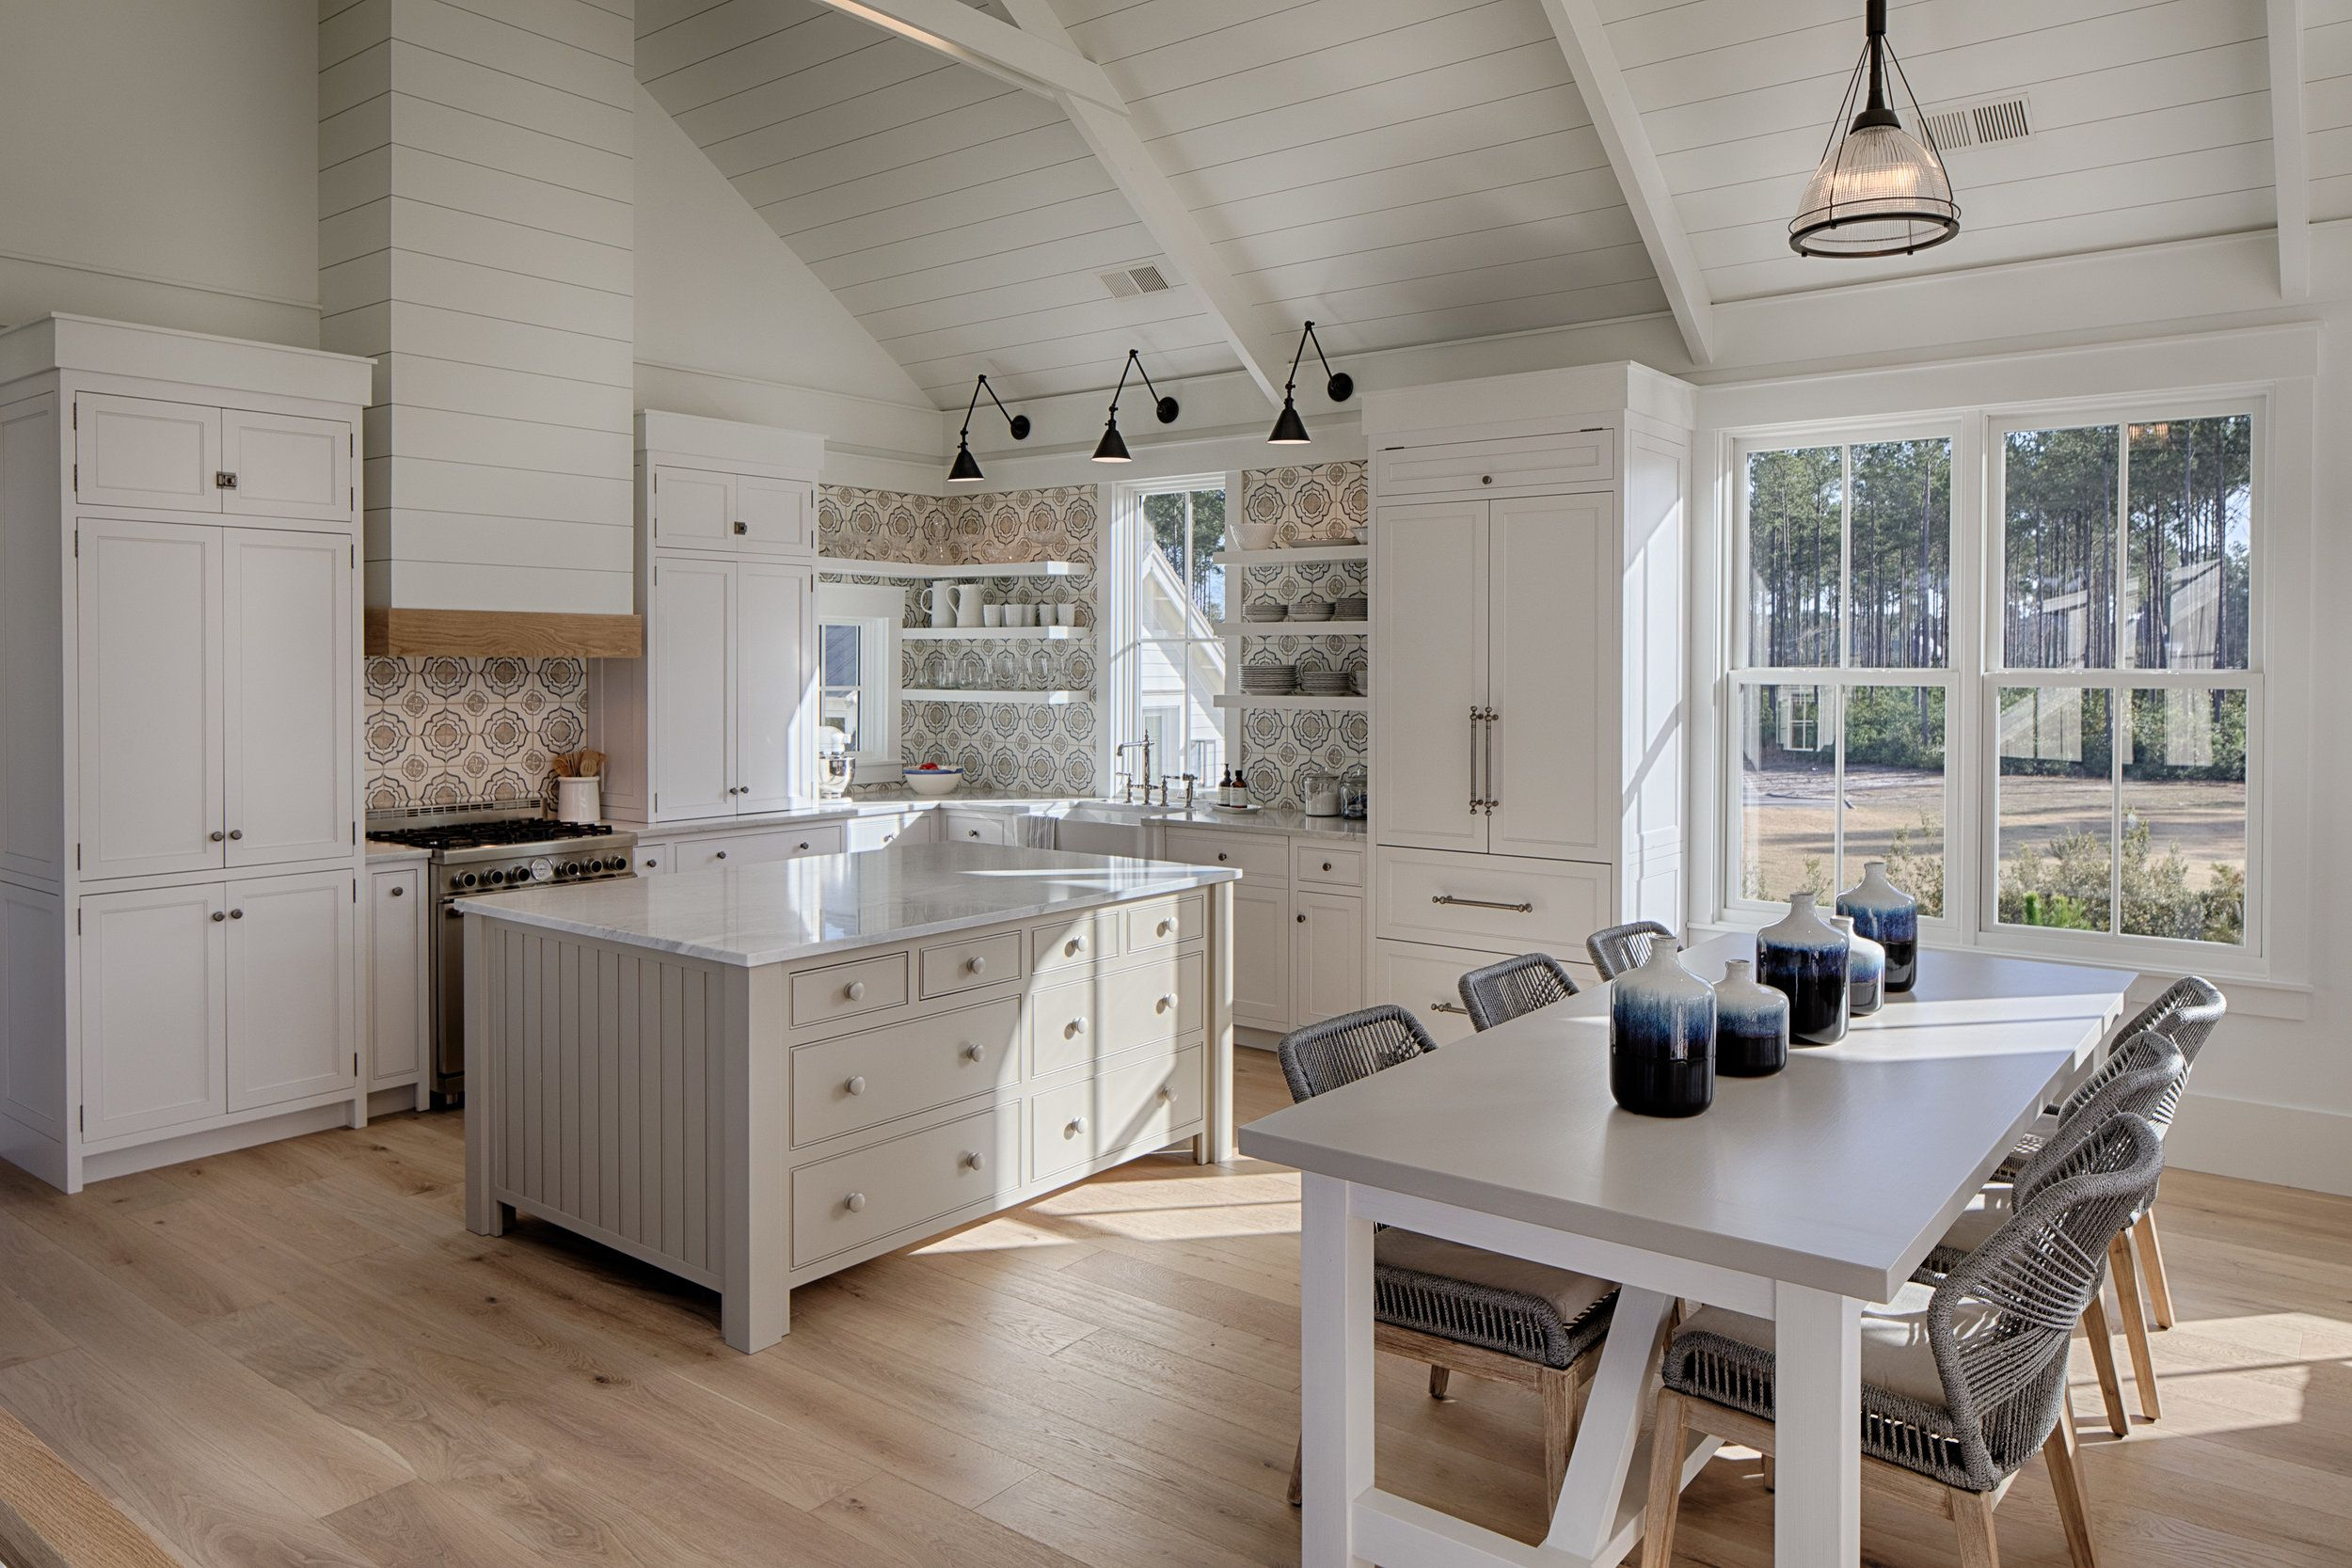 Coastal cottage interior design inspiration part 1 get